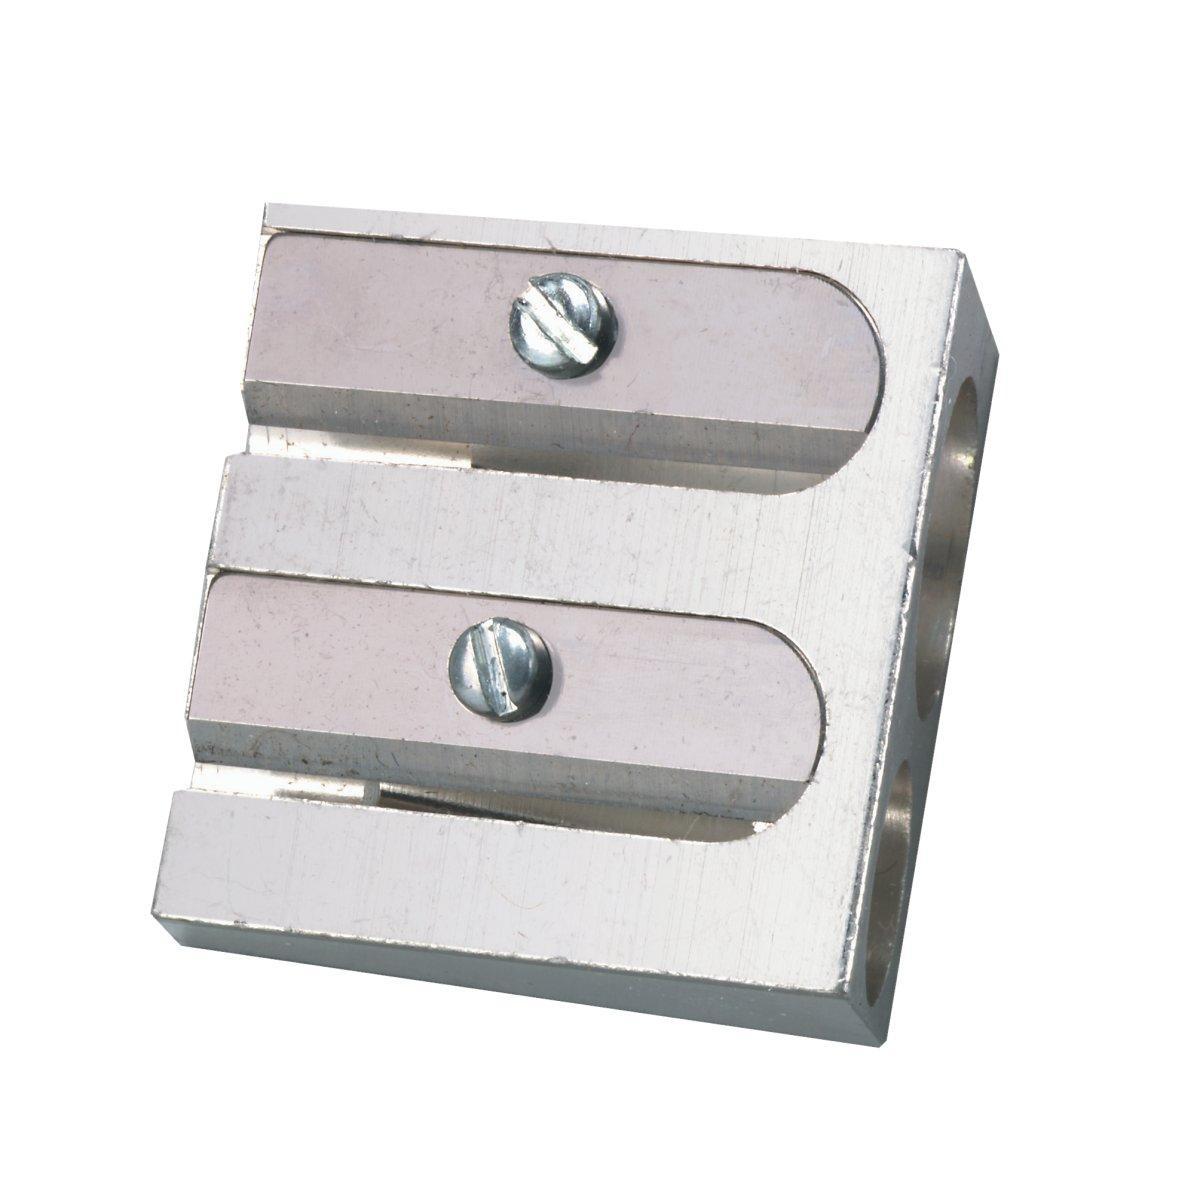 Точилка Herlitz Metal Double метал 2 діаметру без контейнера